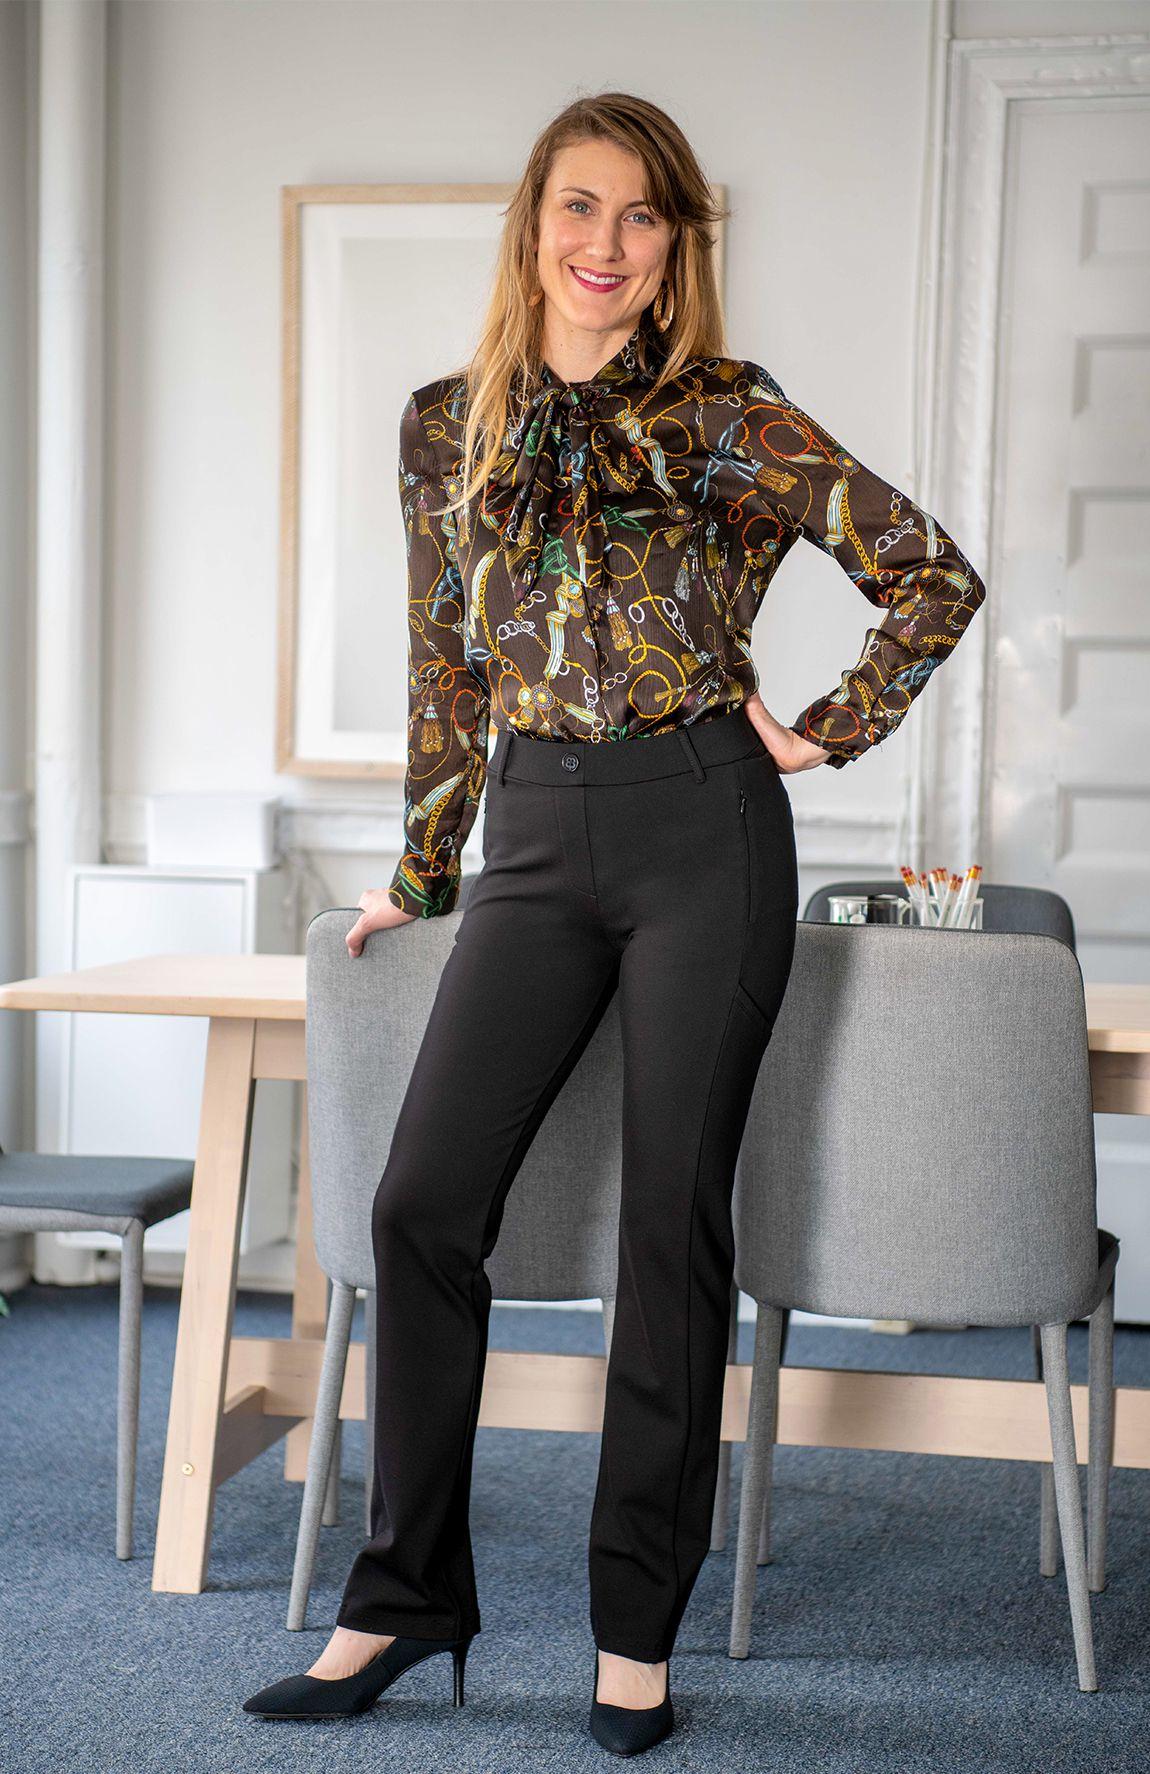 Straight Leg Plentiful Pocket Dress Pant Yoga Pants Black Dress Yoga Pants Pocket Dress Clothes [ 1774 x 1150 Pixel ]